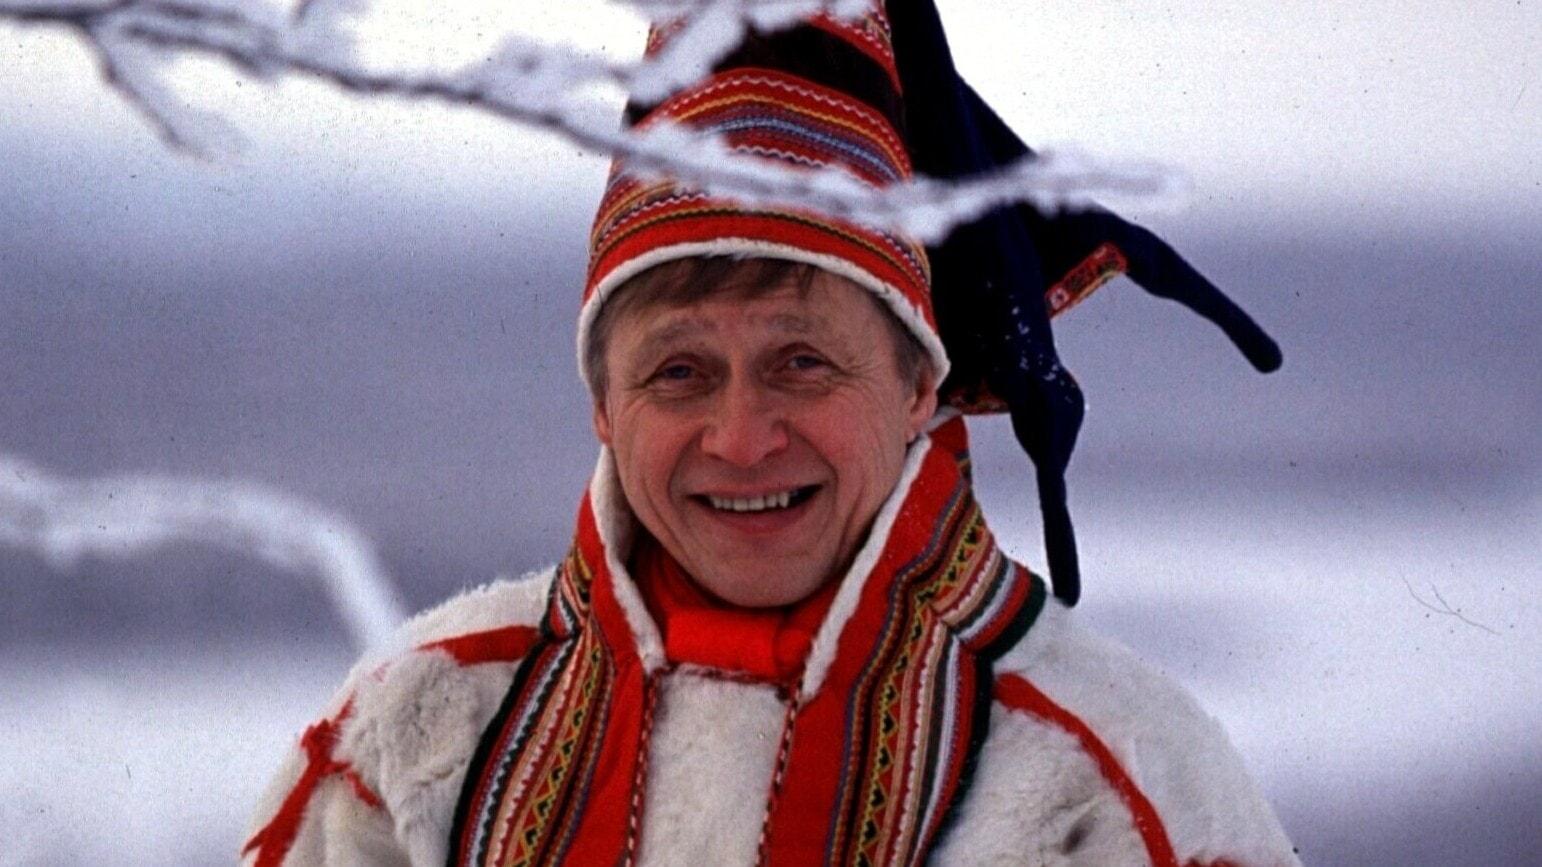 Nils Aslak Valkeapääs fågelsymfoni